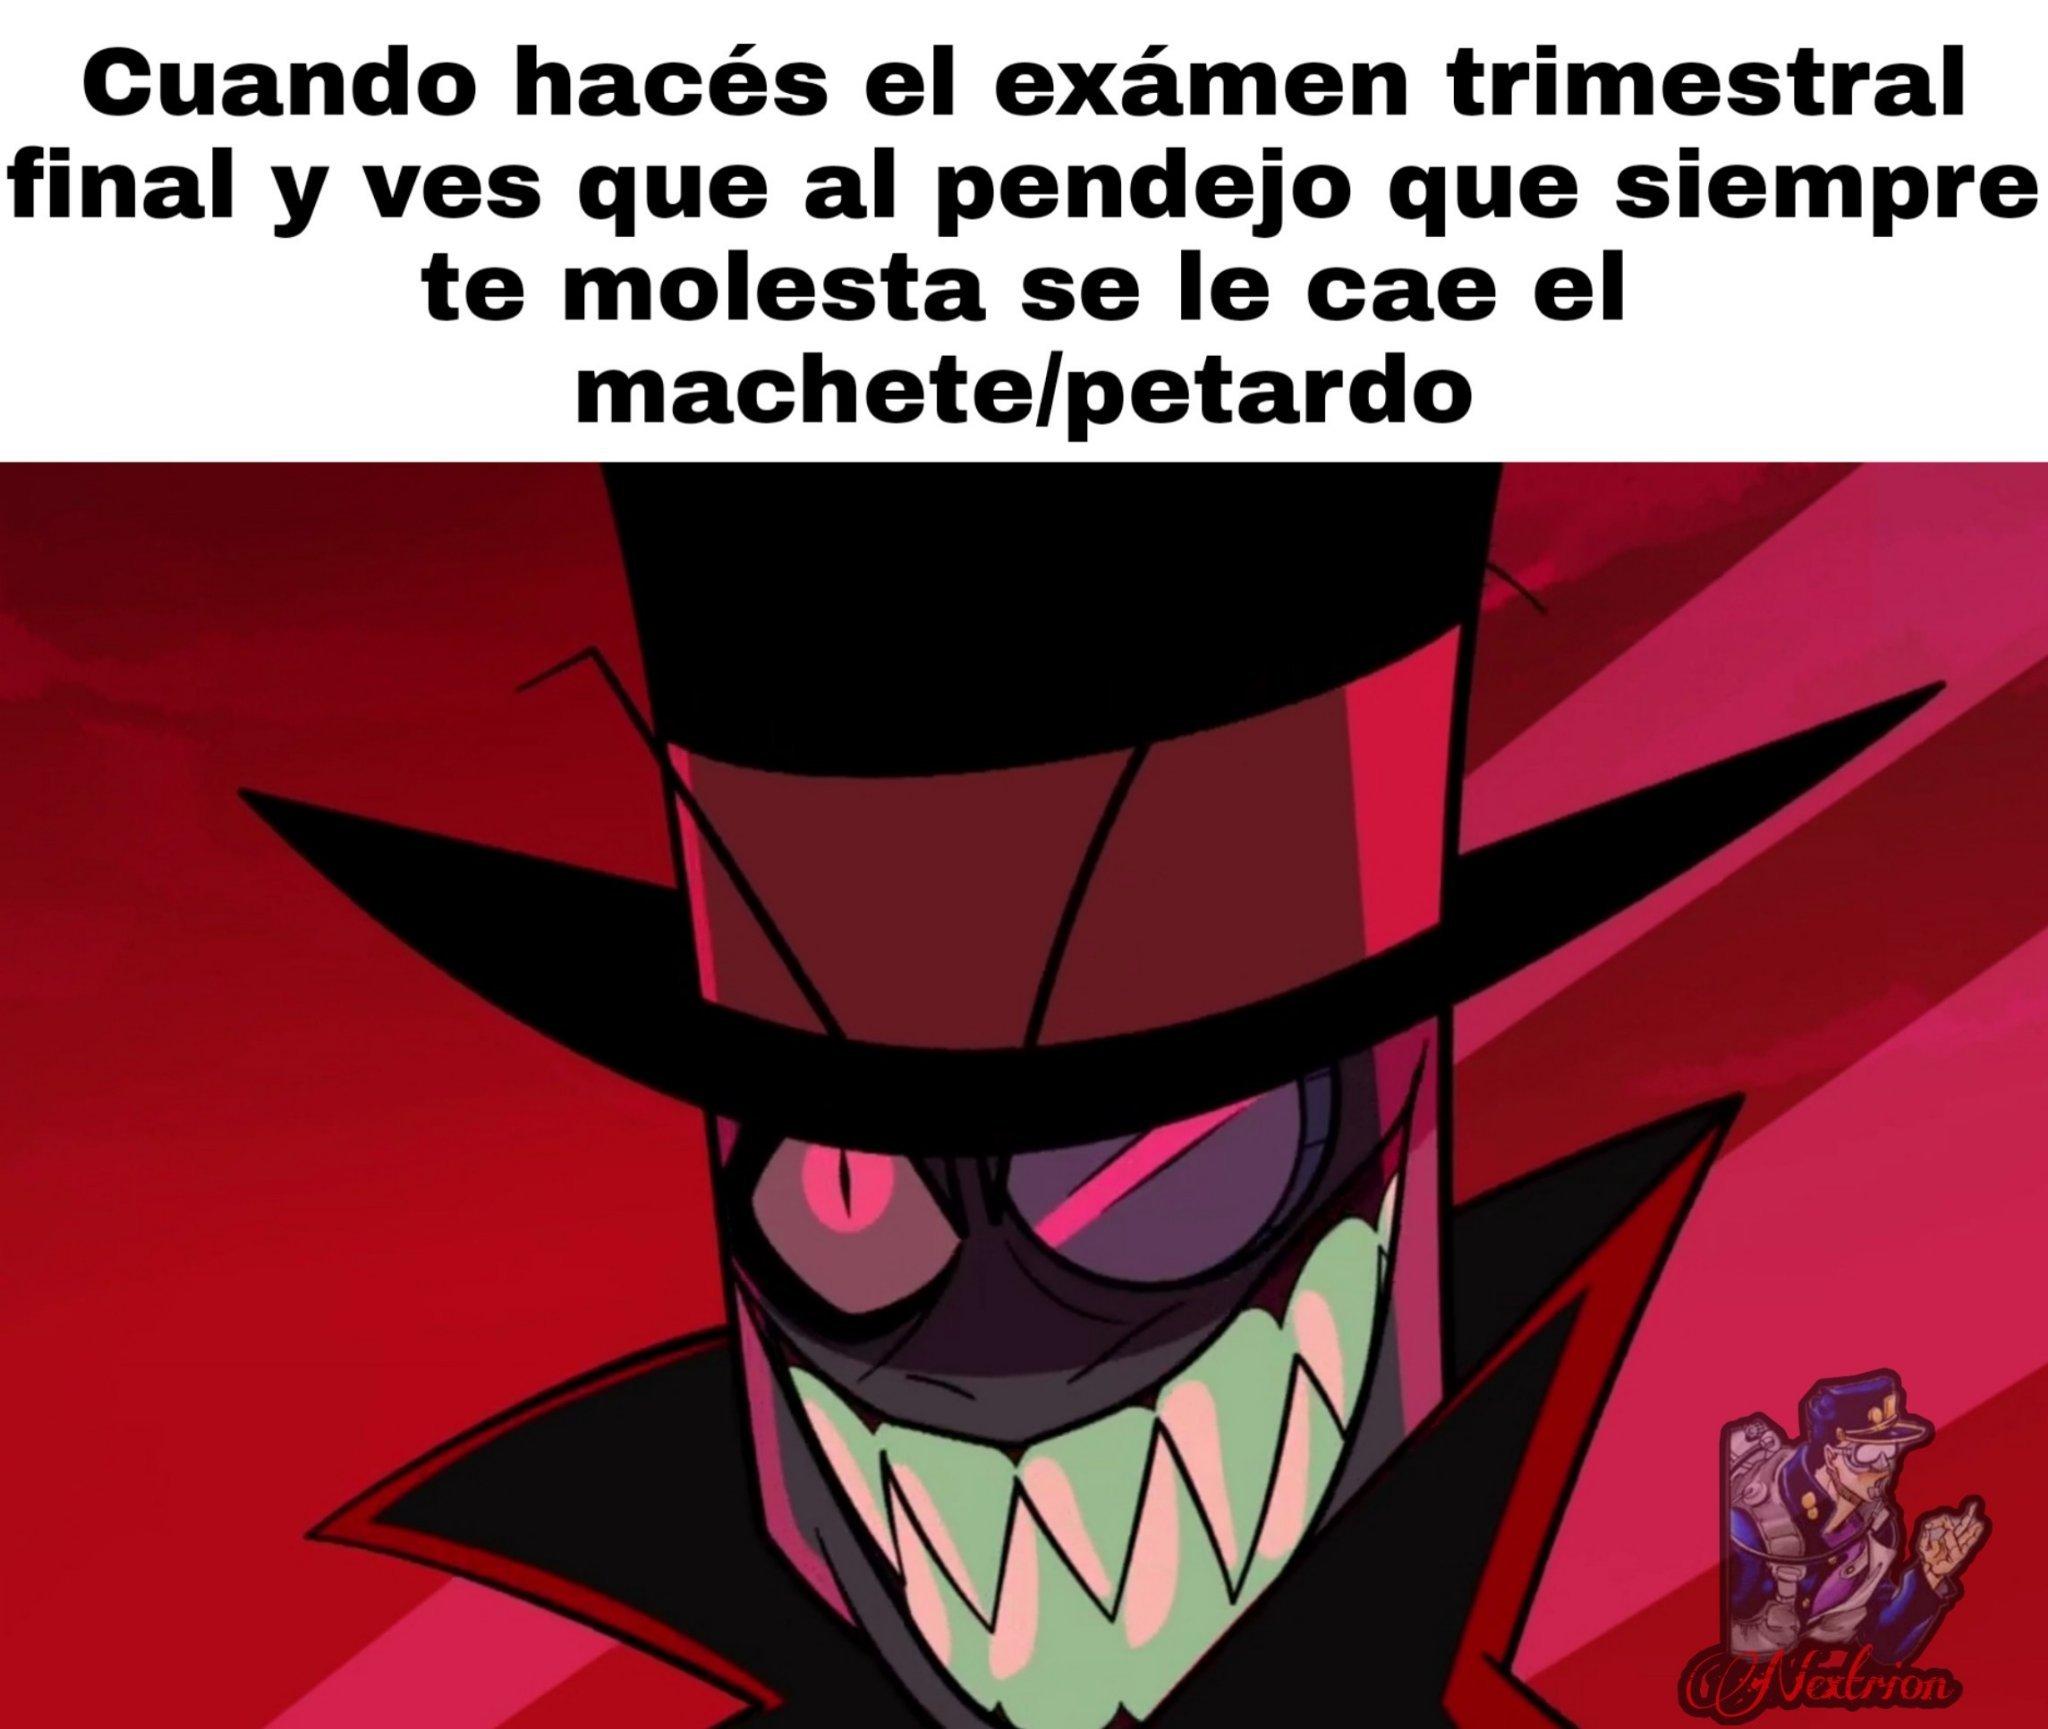 Venganza Gordito >:D - meme